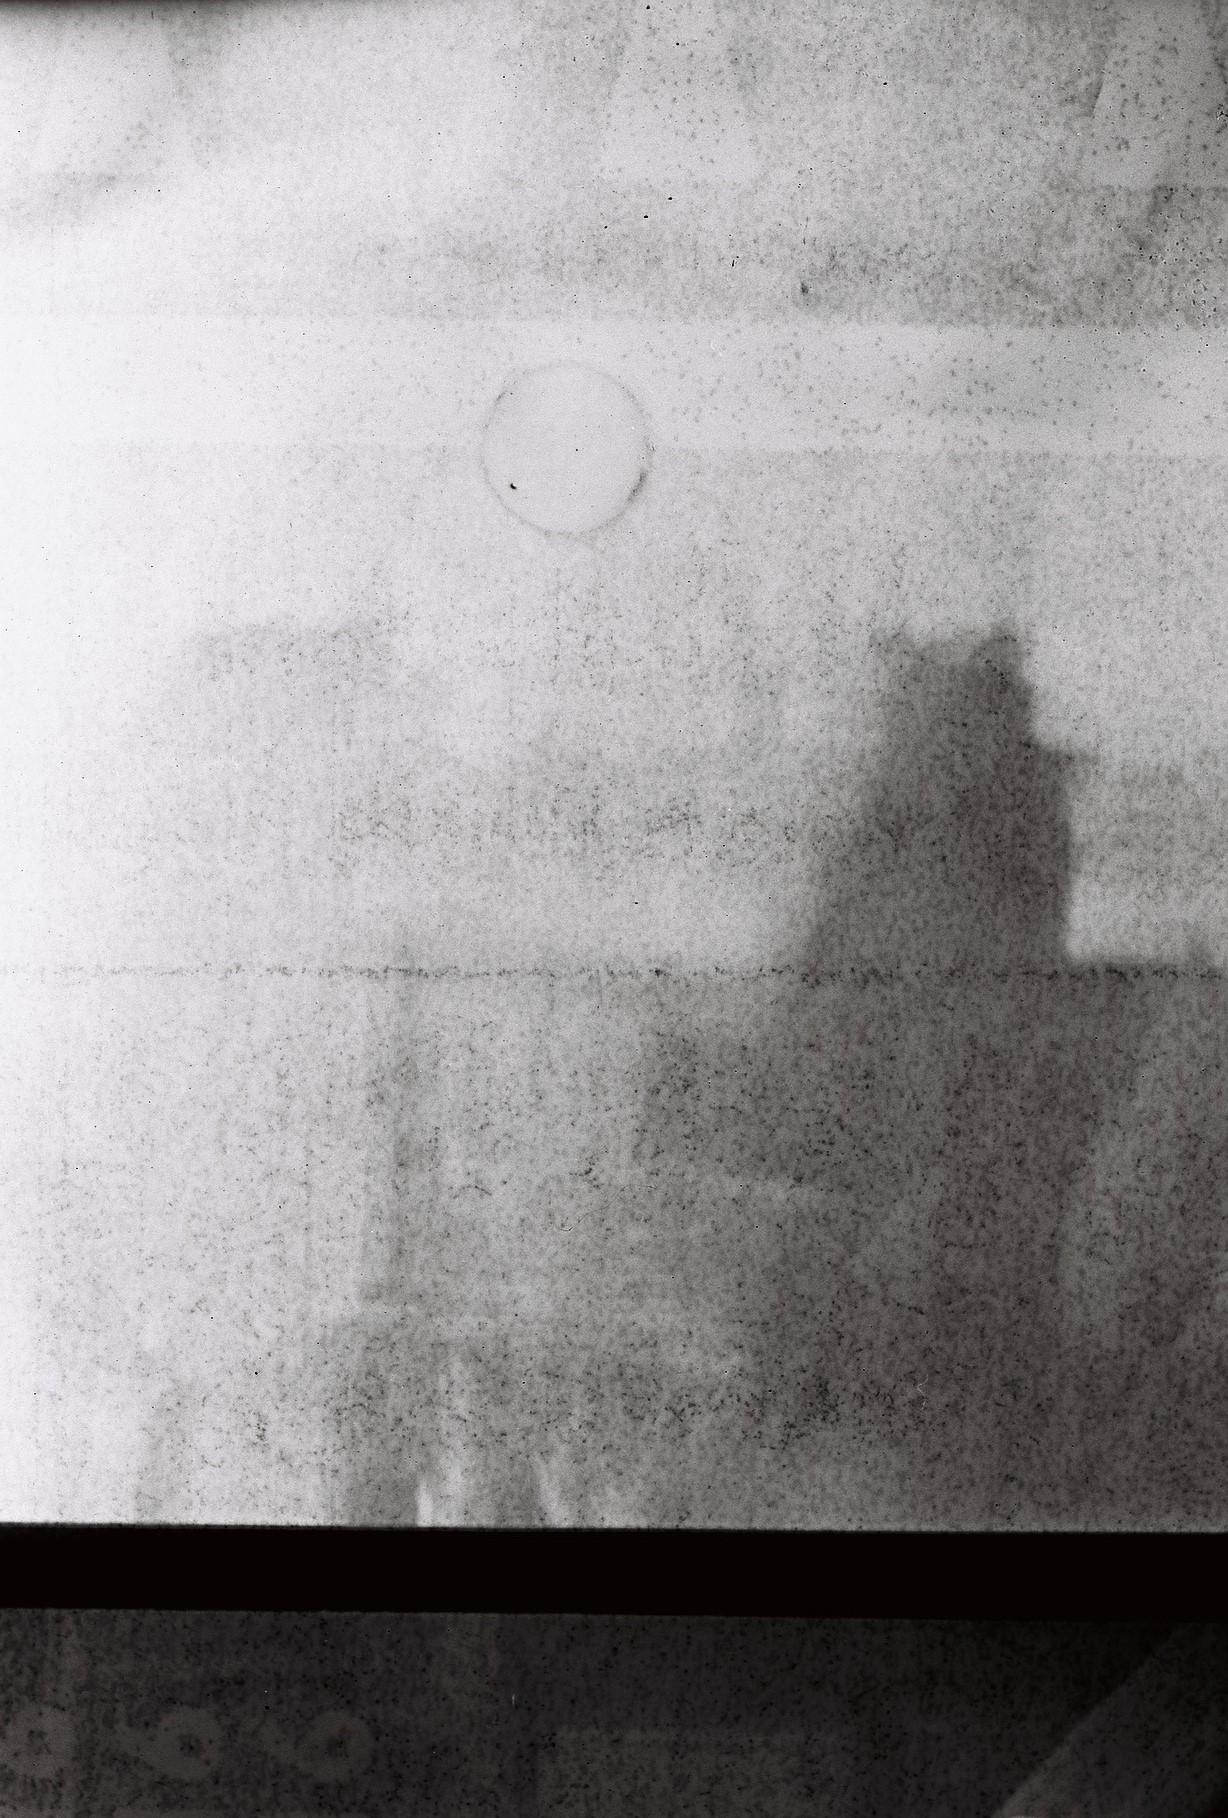 Black Side of the Glass by OnurKorpeoglu